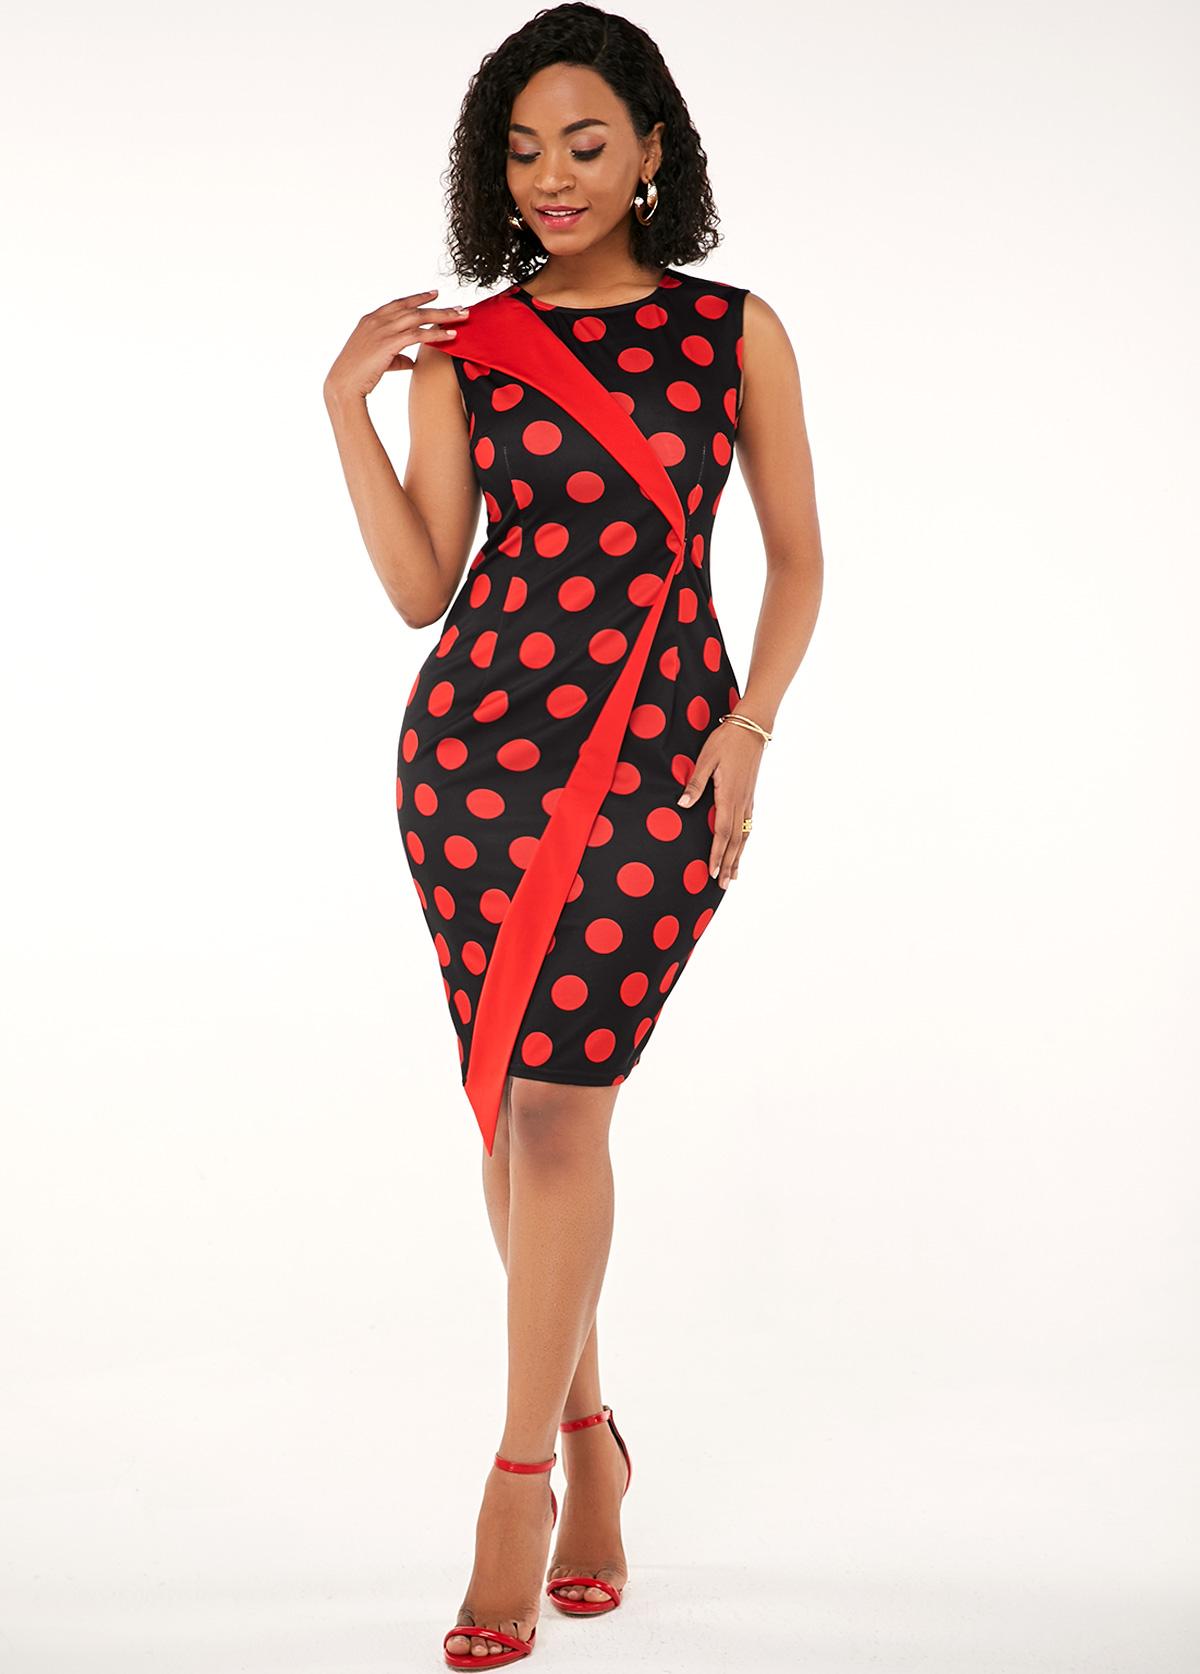 Sleeveless Polka Dot Round Neck Dress